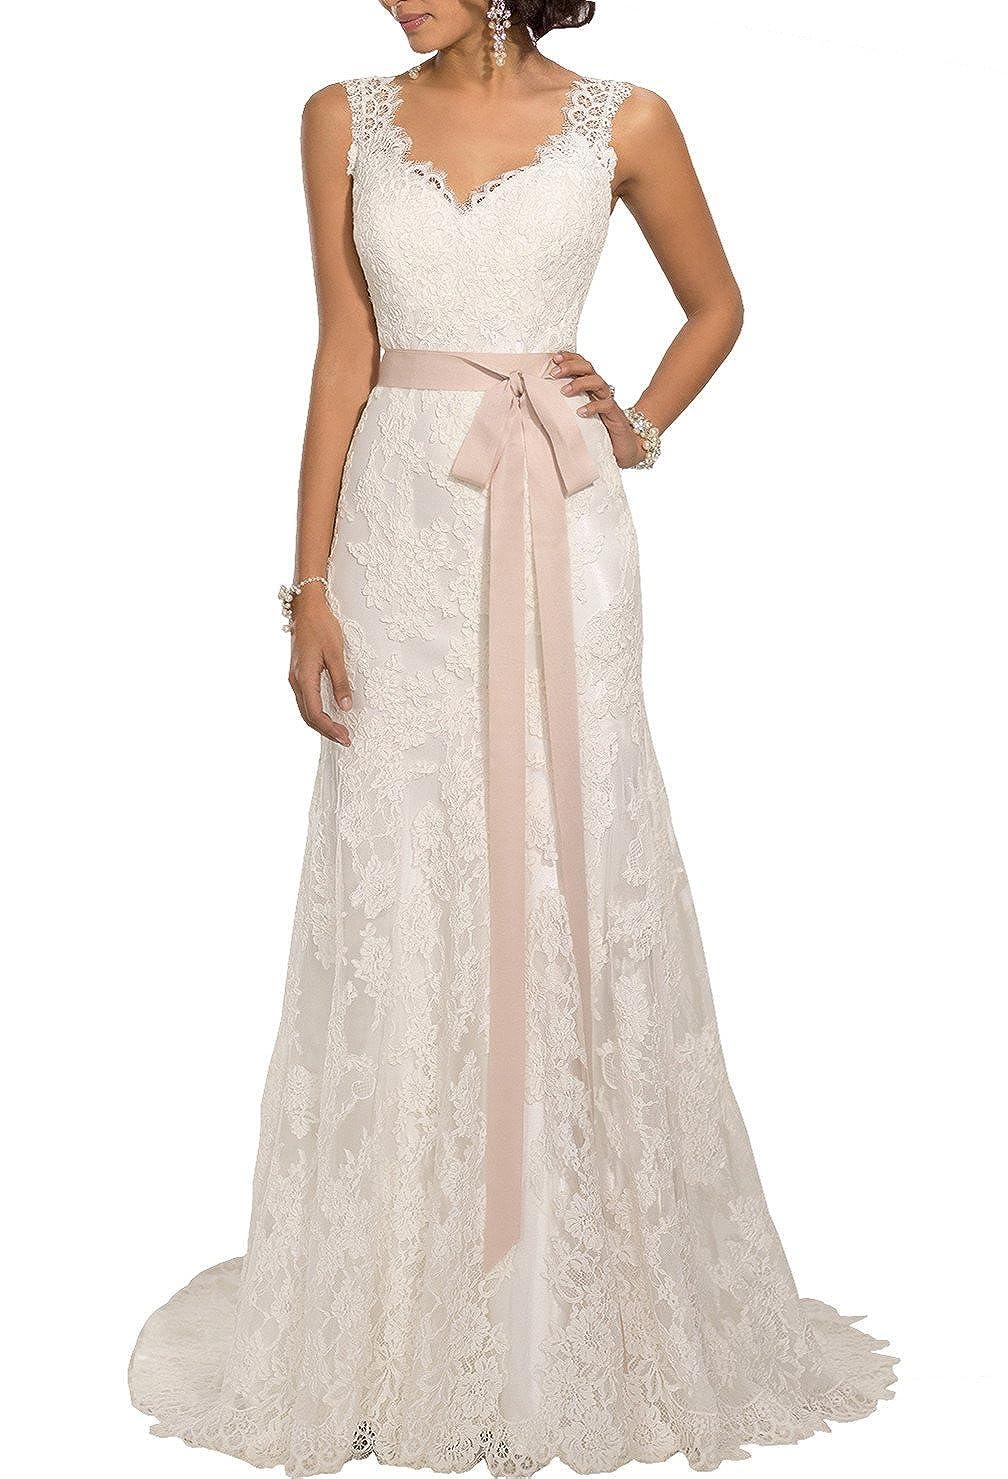 Changjie Women's V-Neck Backless Lace Bridal Wedding Dresses CJ382